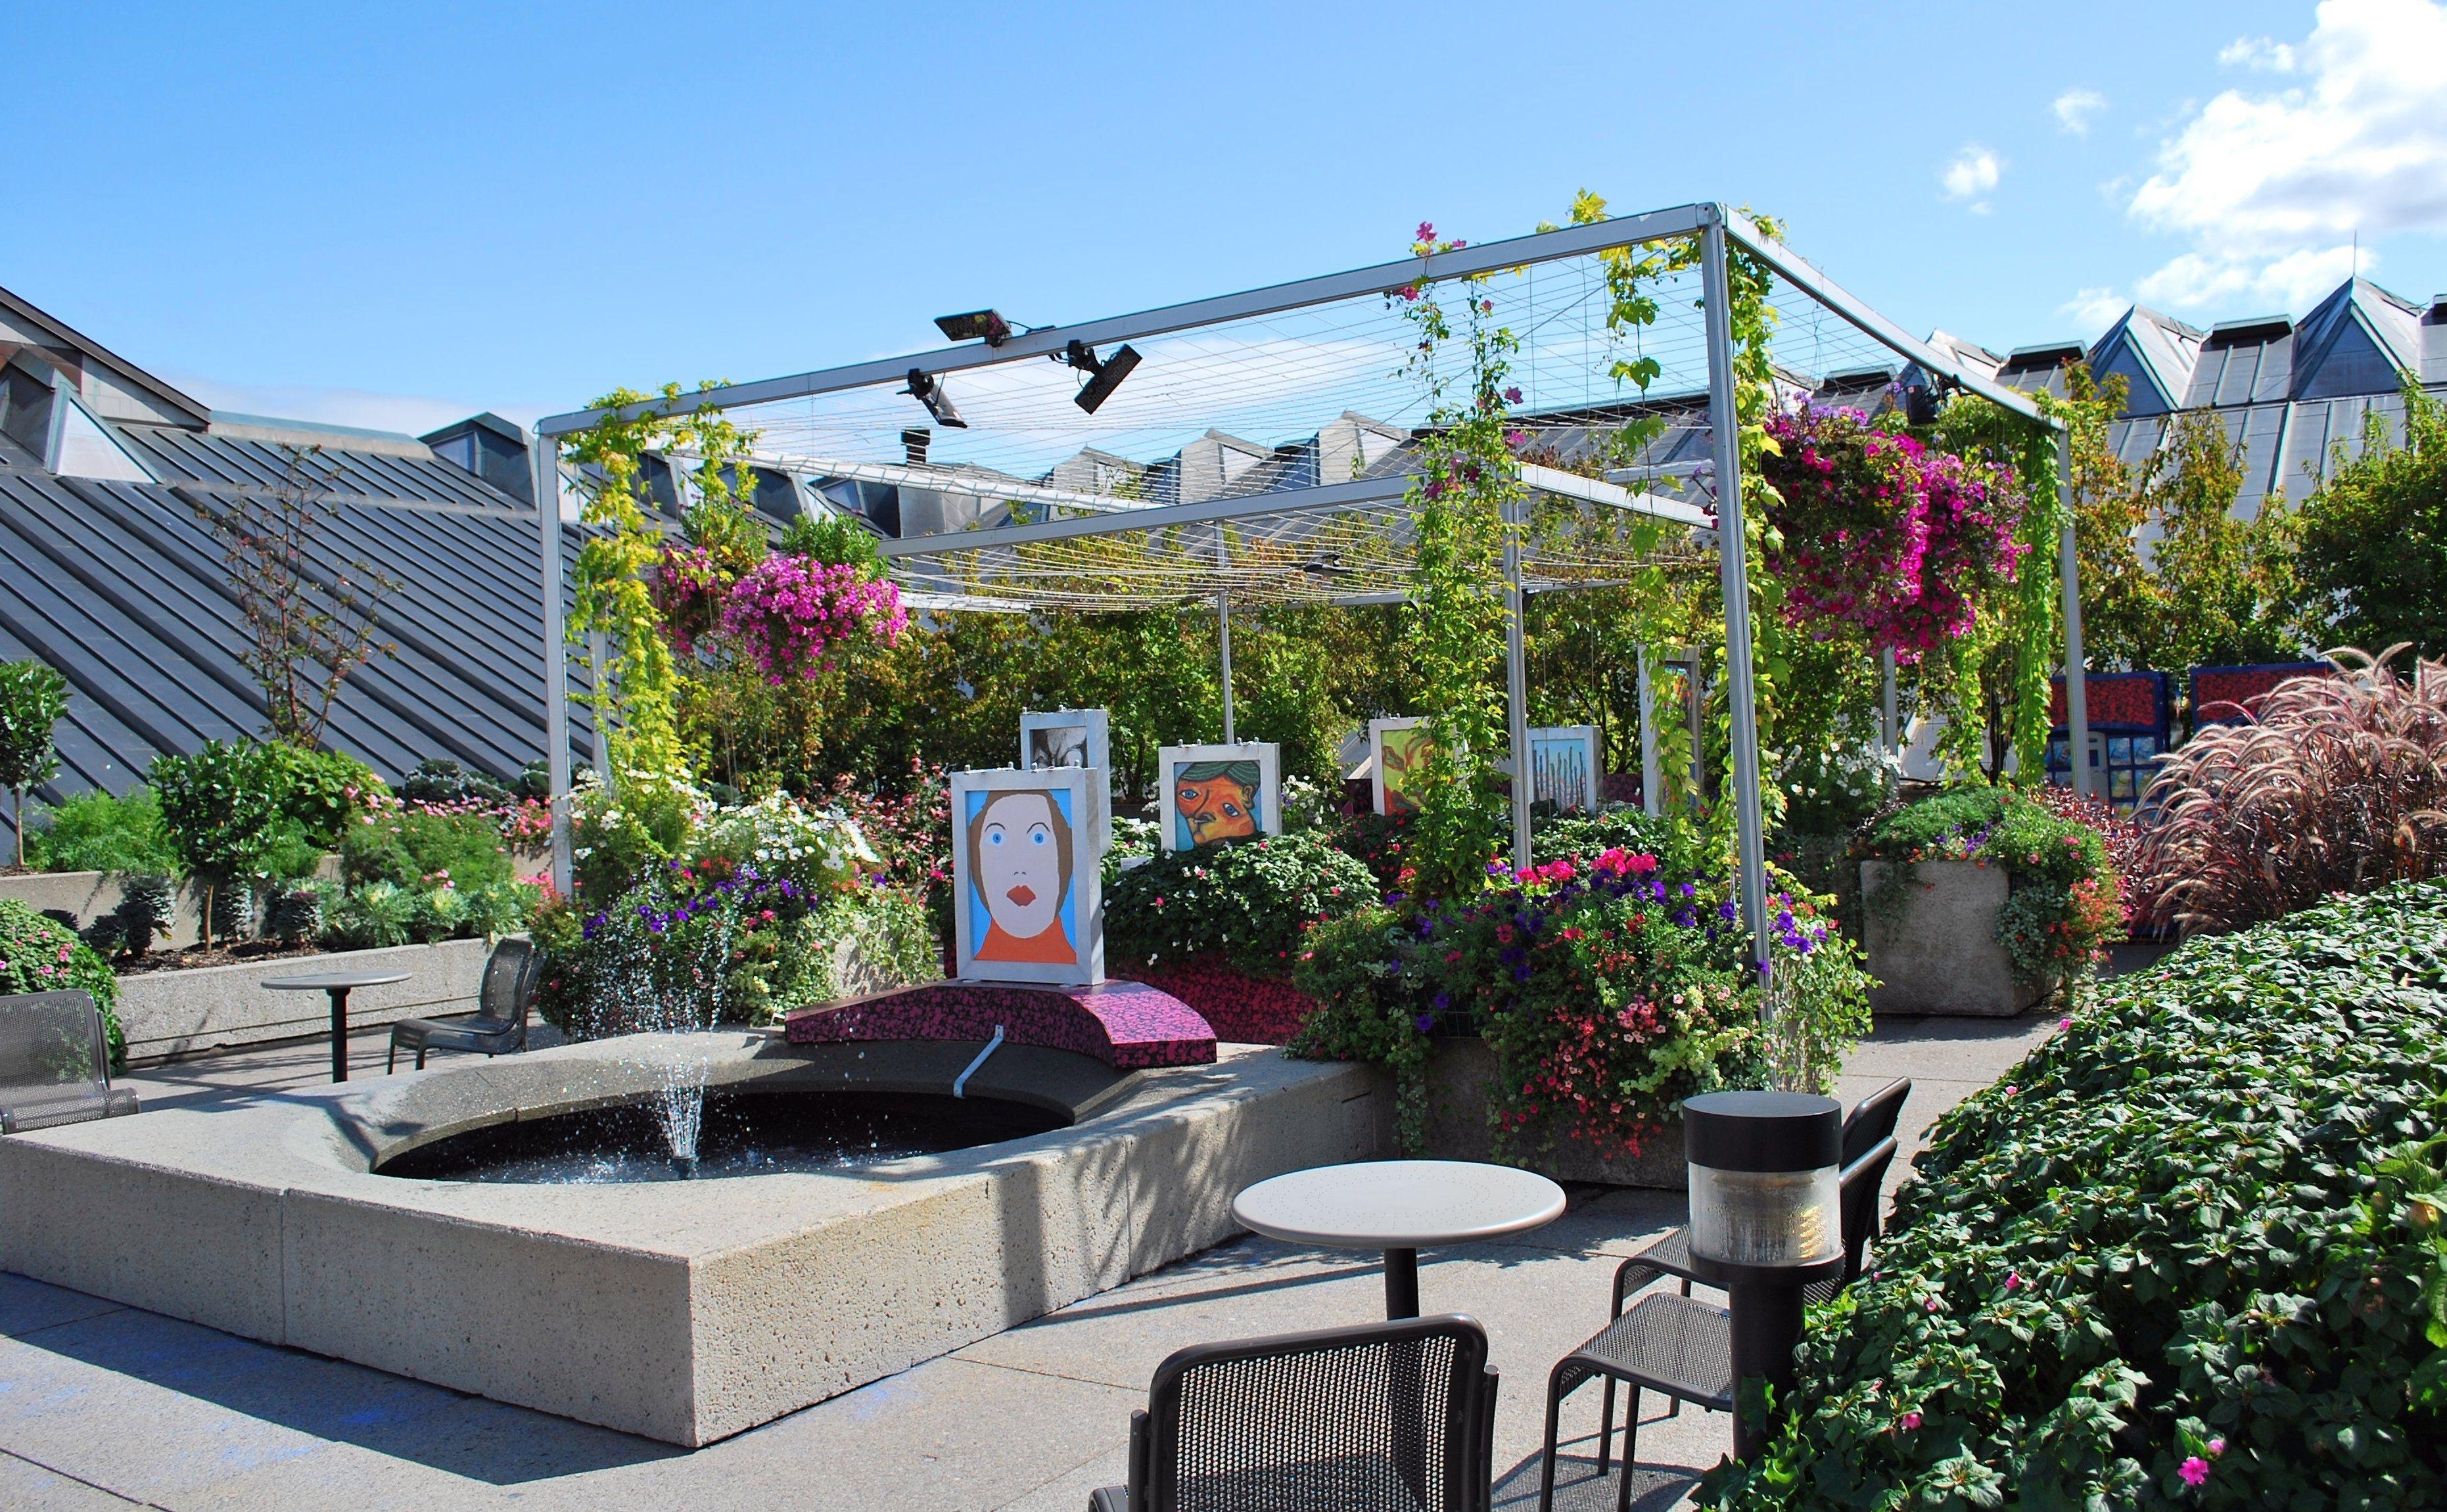 Garden Landscape Design Cost Bathroom Design - Rooftop vegetable garden ideas